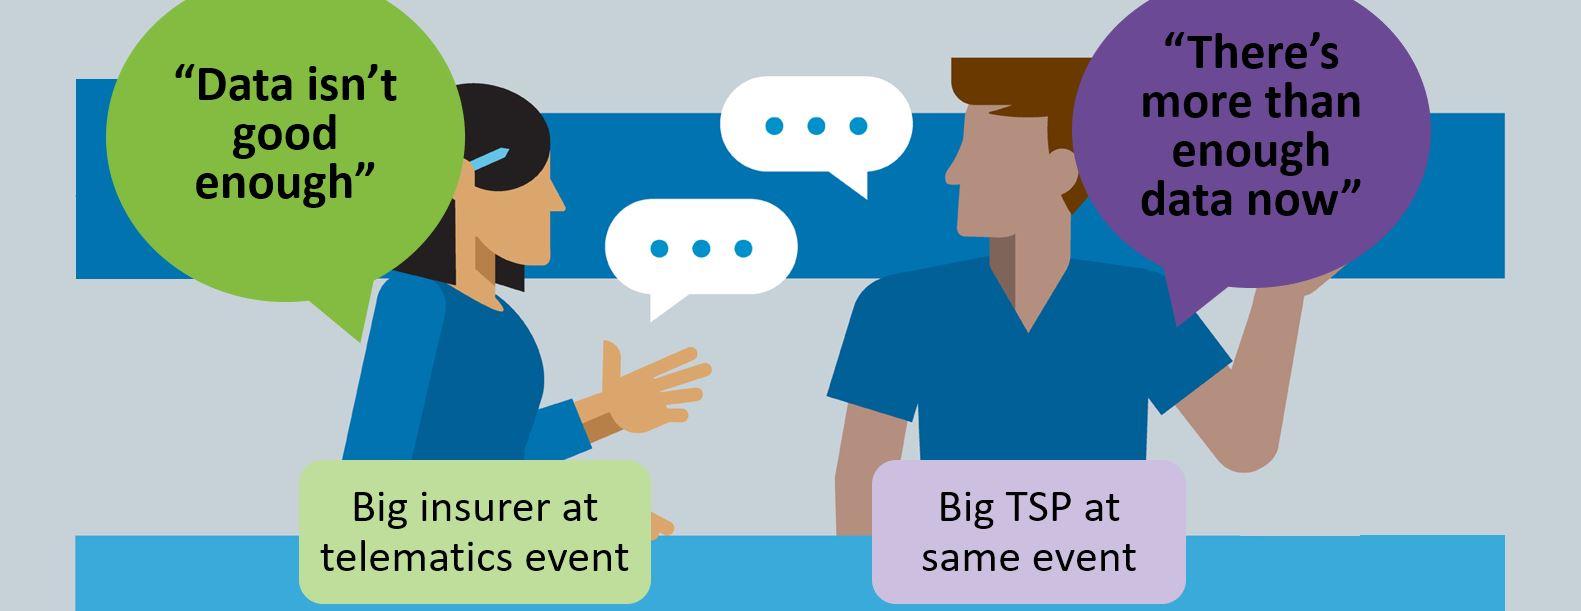 right data vs any data - big insurer vs TSP